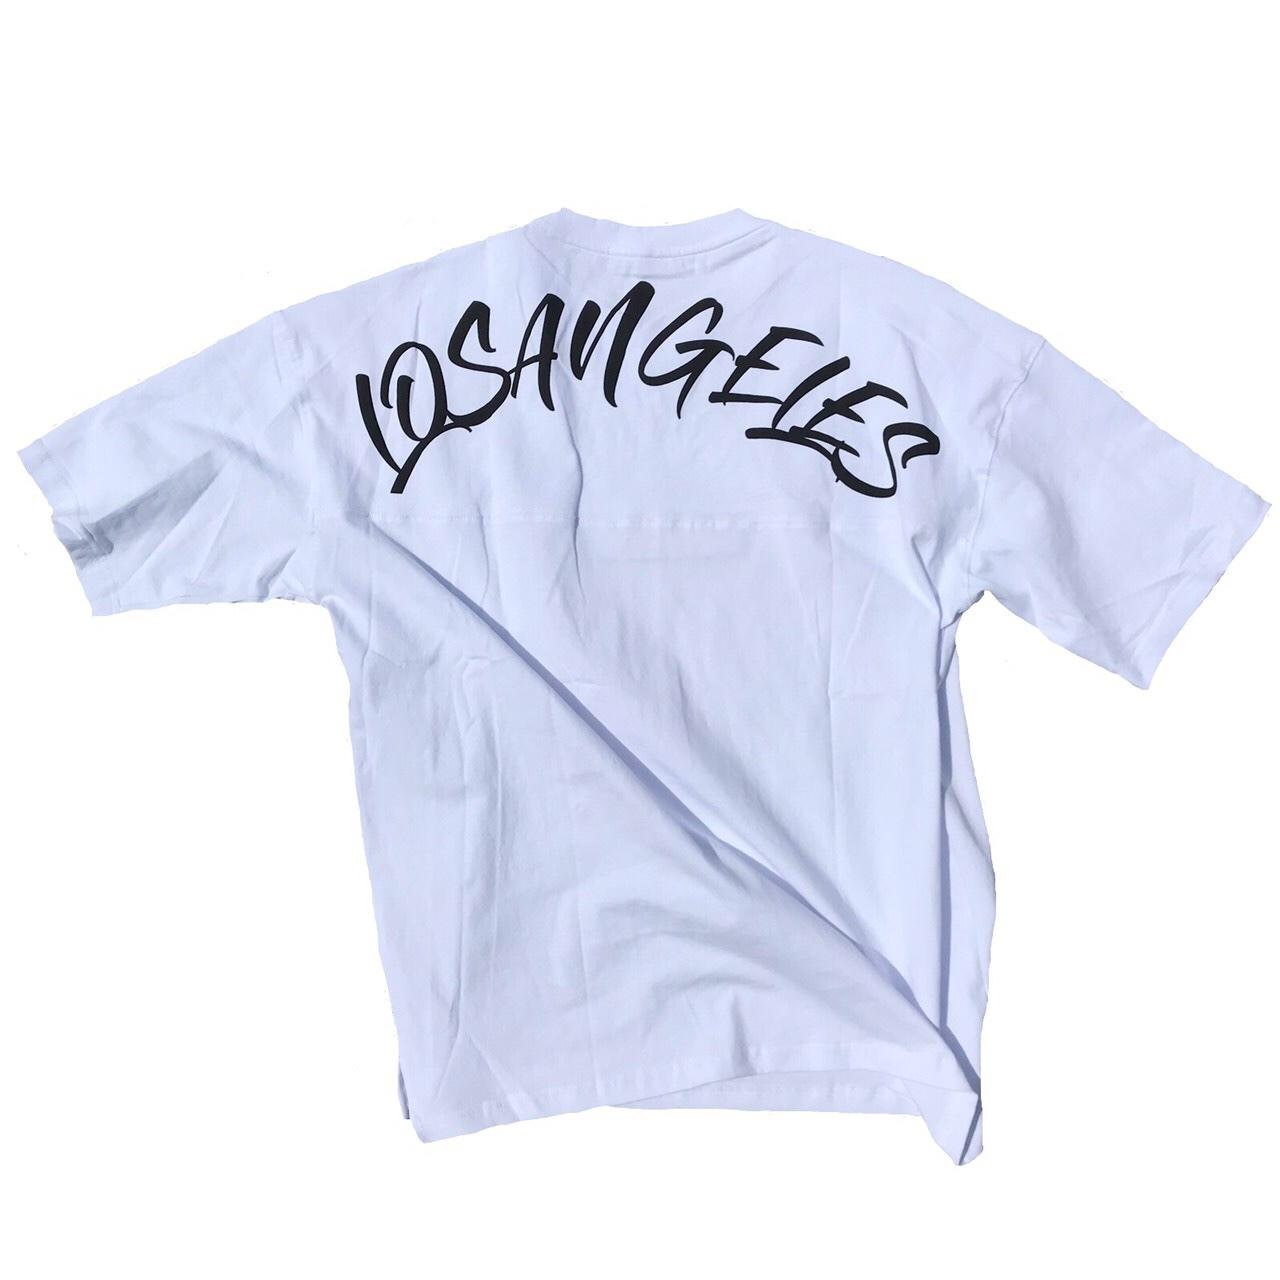 LosAngeles Big Tee【White】